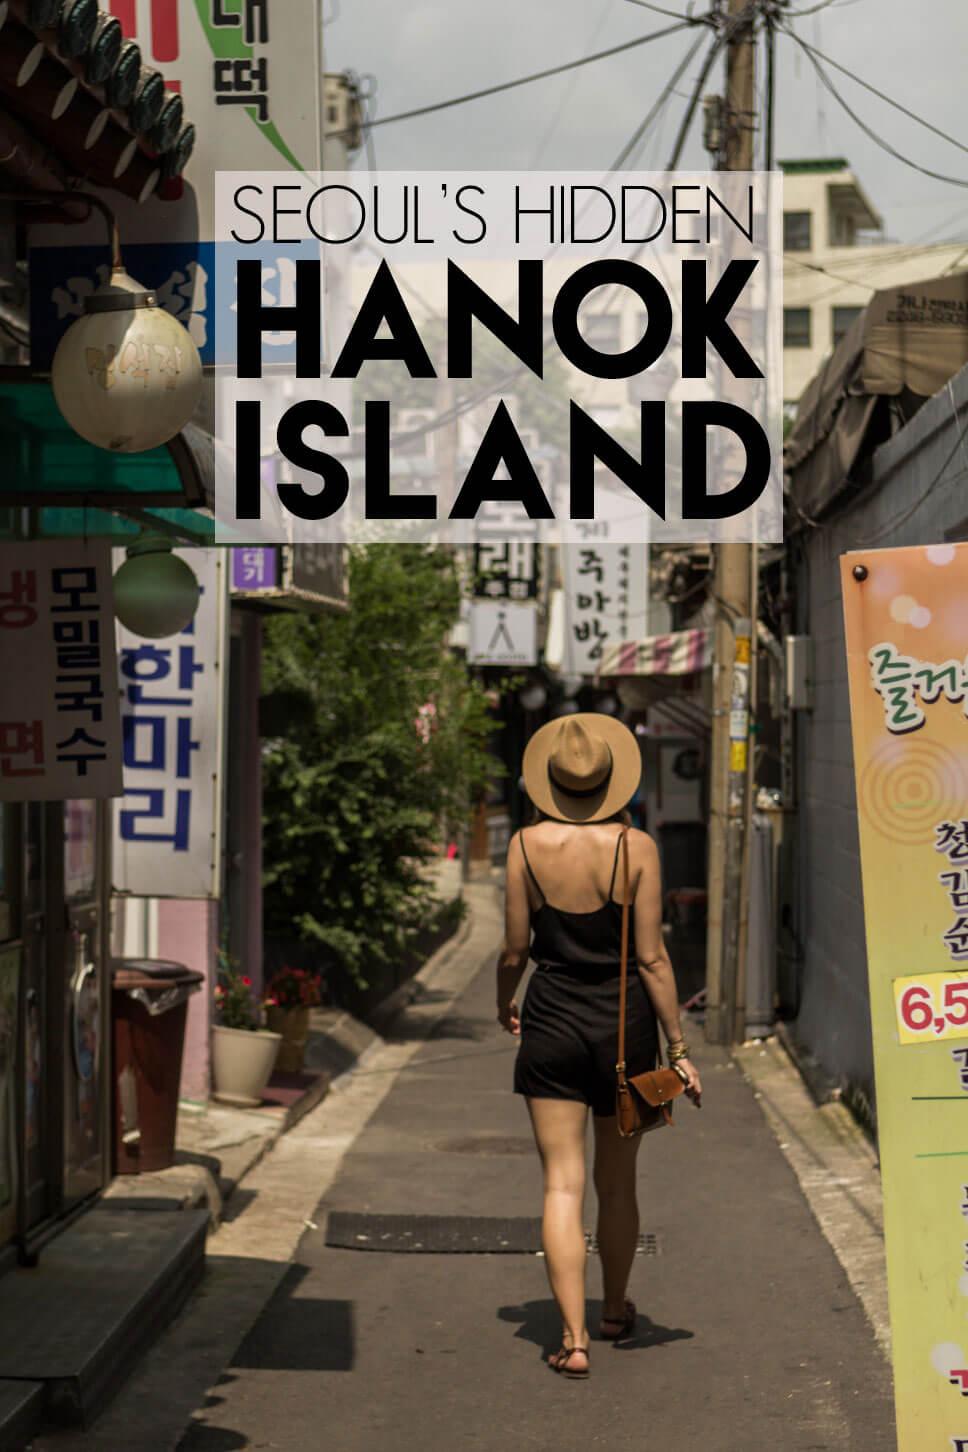 seouls-hanok-island-pinterest-bw